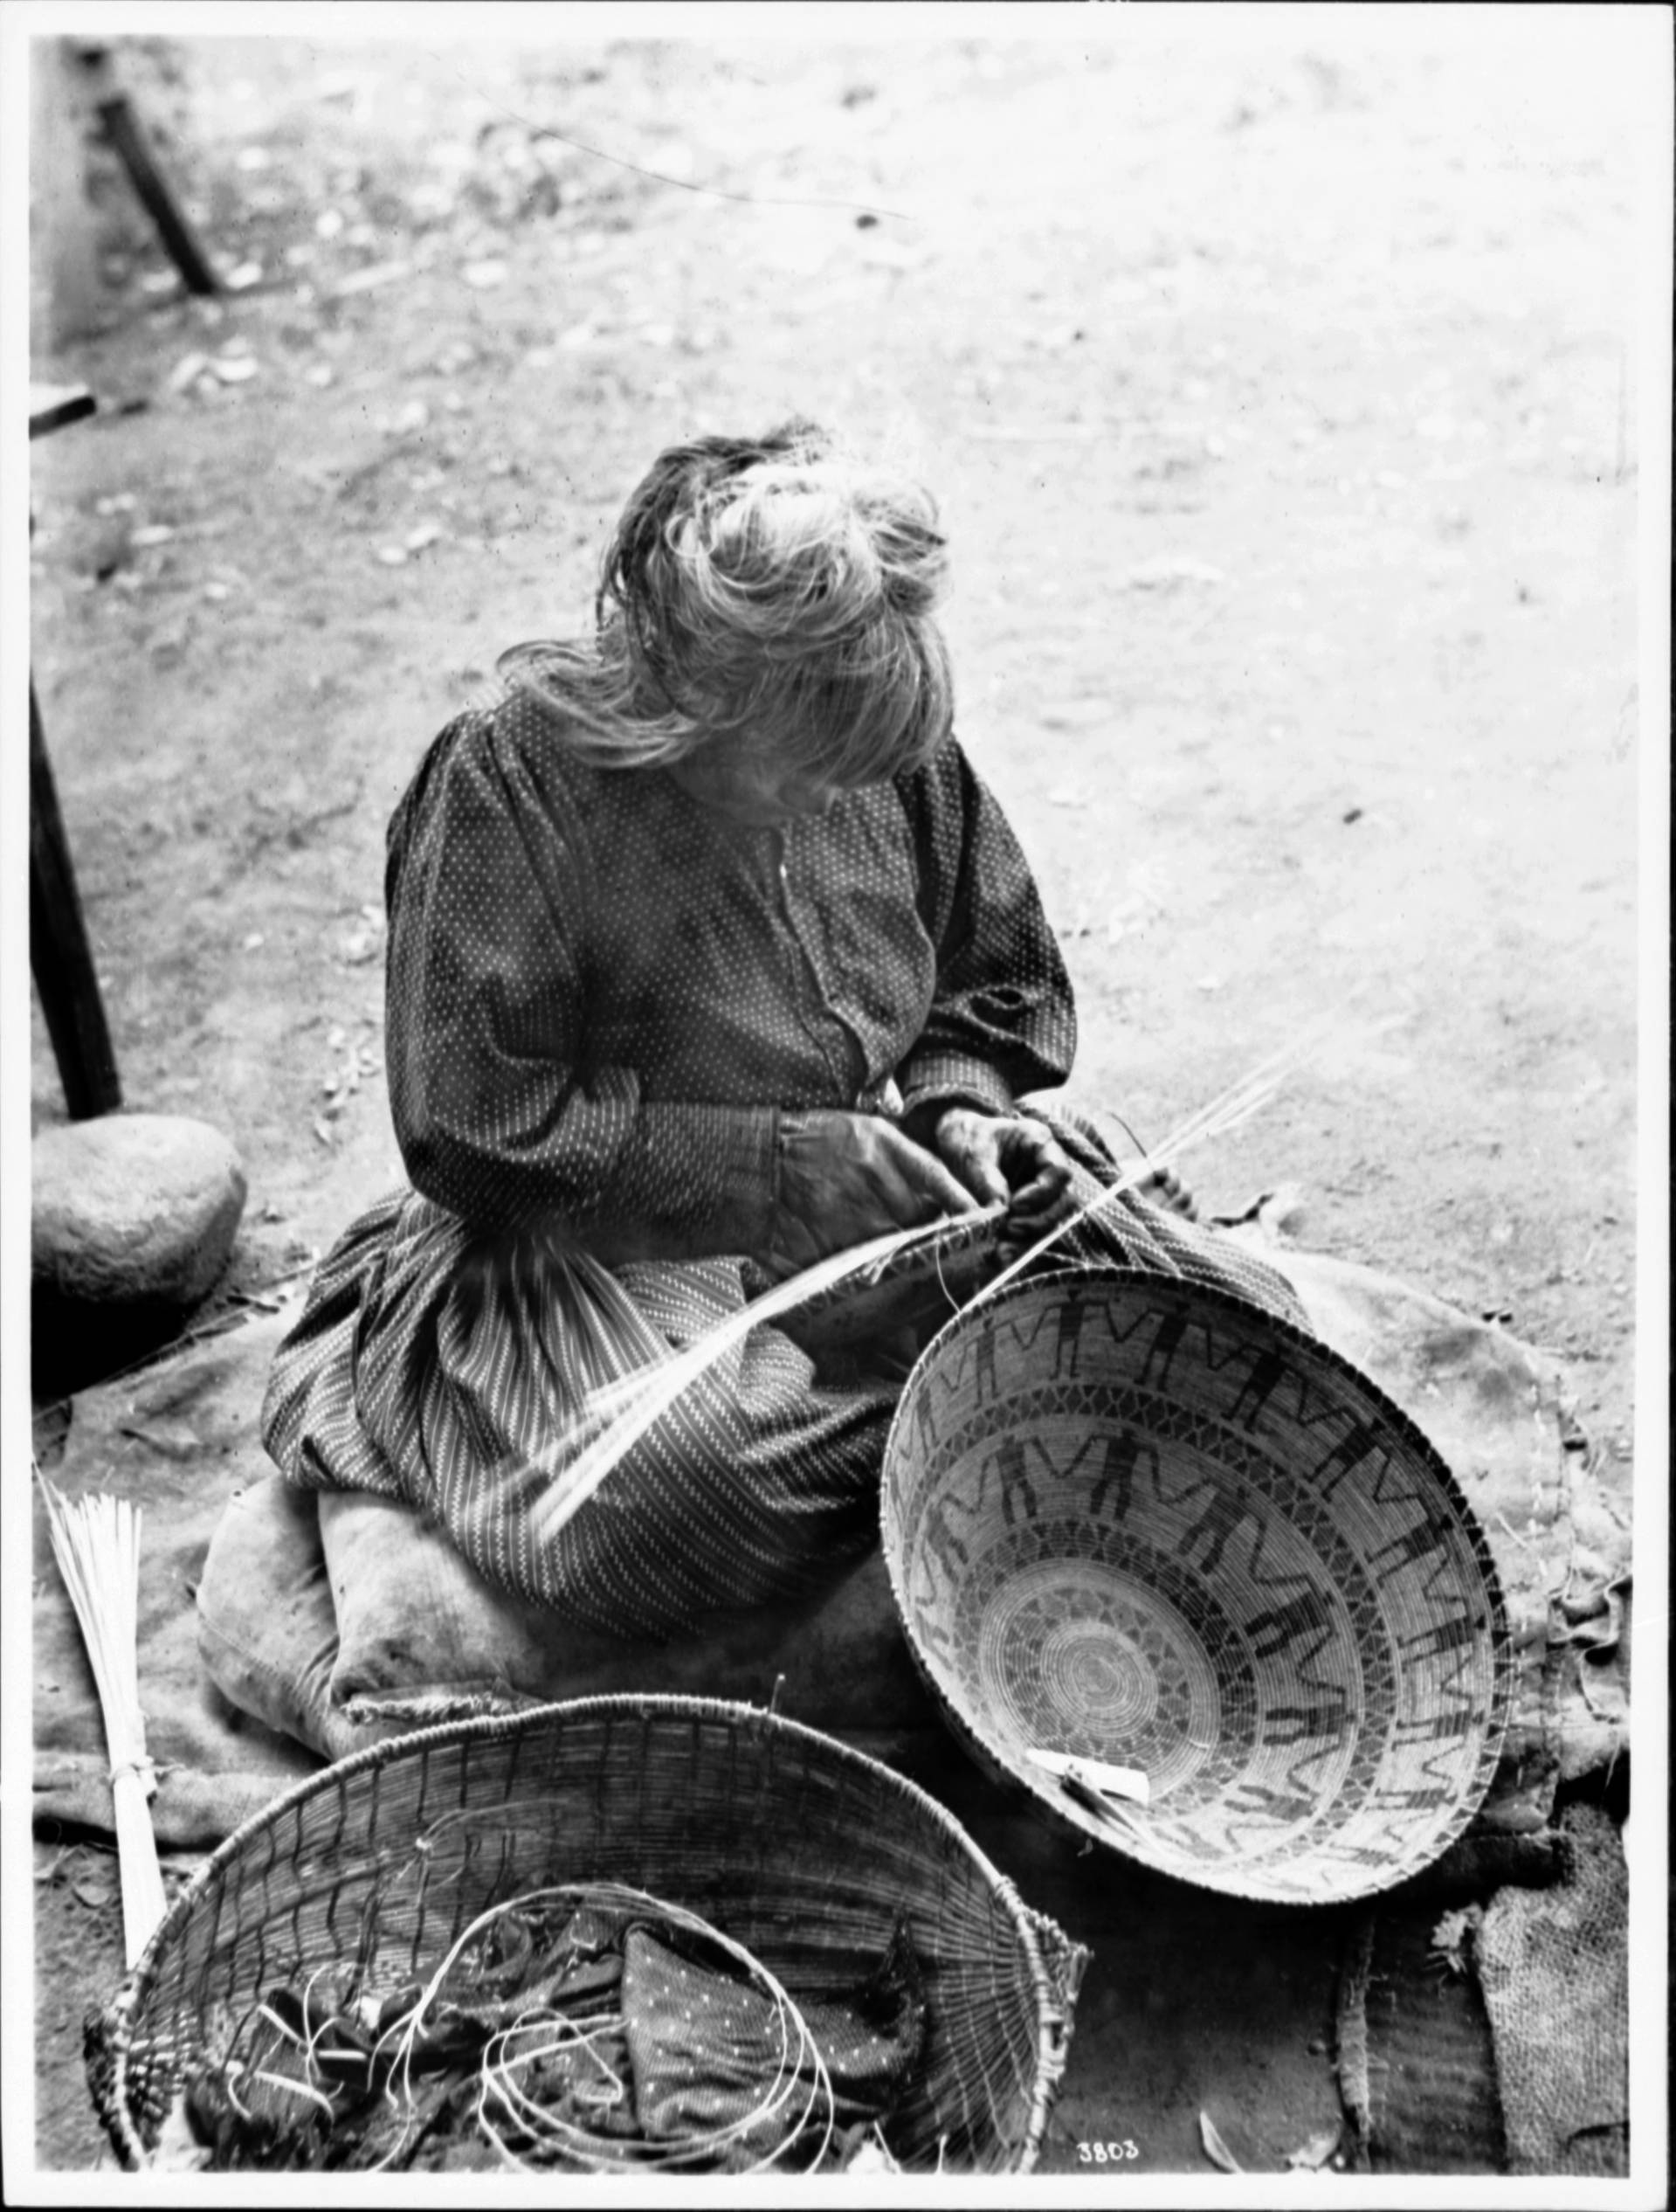 Indian Woman Working Fast Food Restaraunt